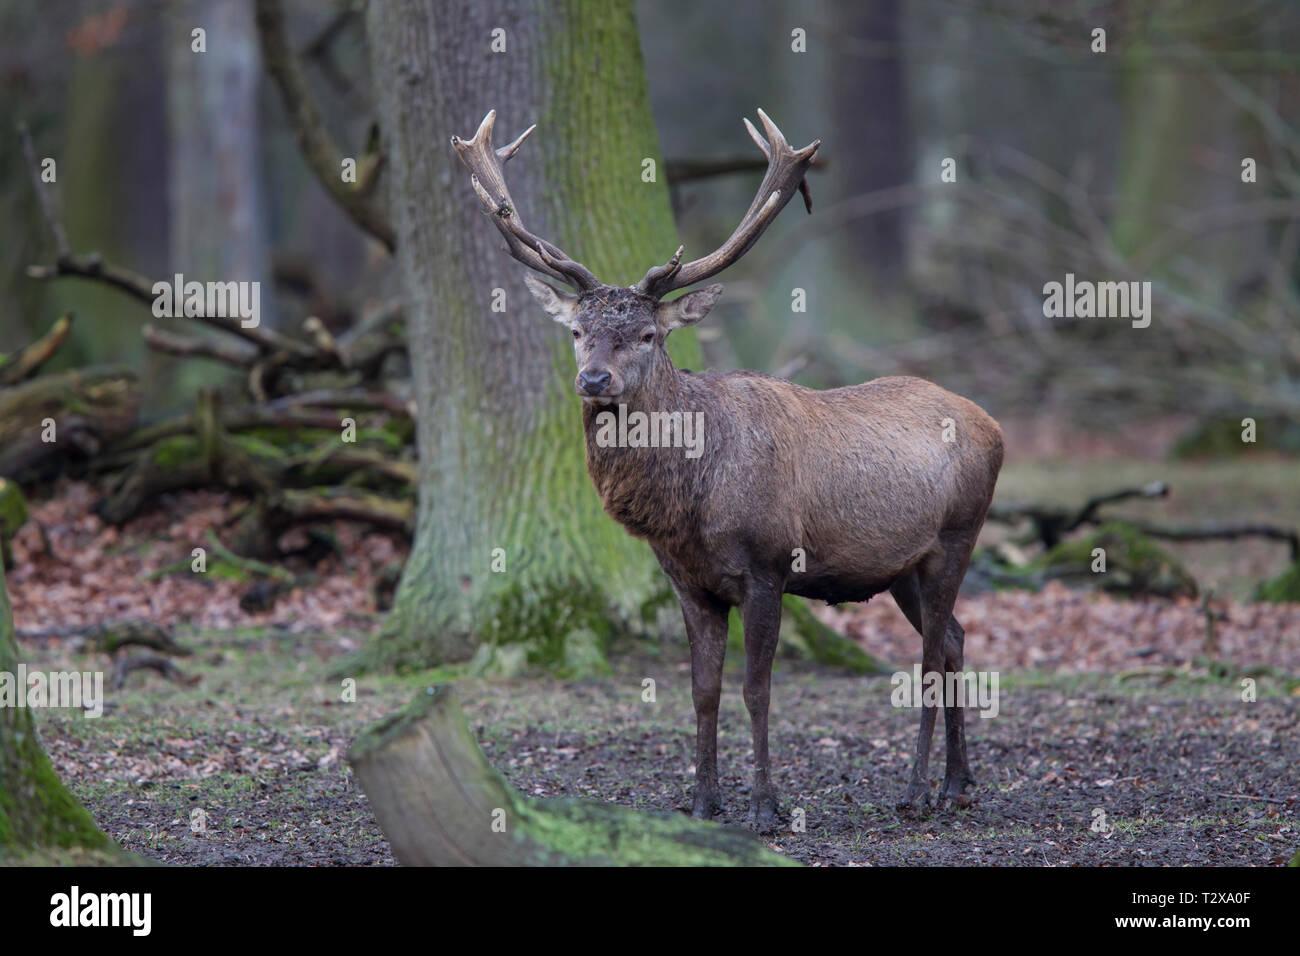 Rothirsch - Maennchen, Cervus elaphus, red deer - male - Stock Image